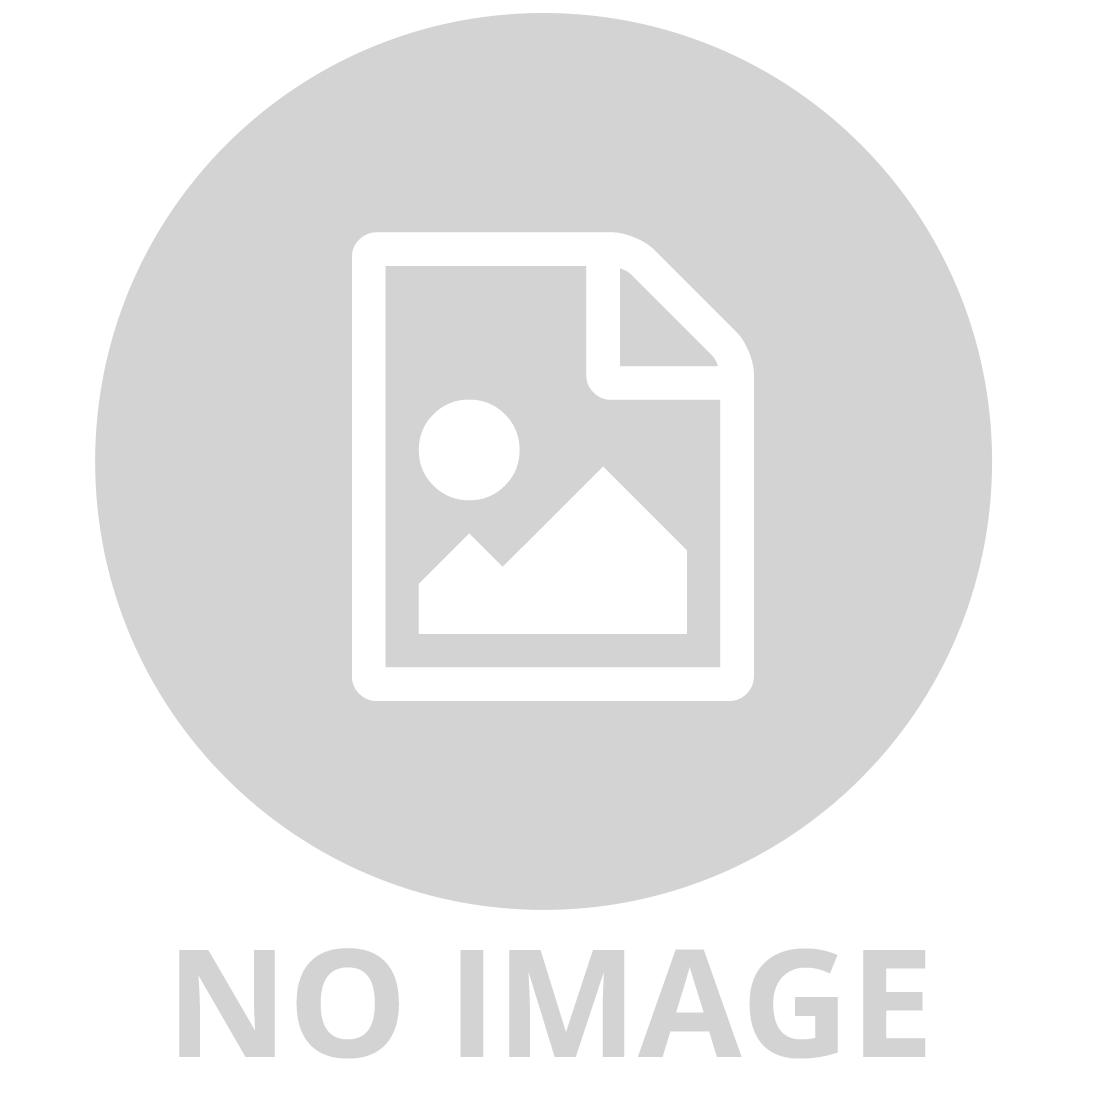 RAVENSBURGER- SPIRIT ADVENTURE ON HORSES JIGSAW PUZZLE 300PCE